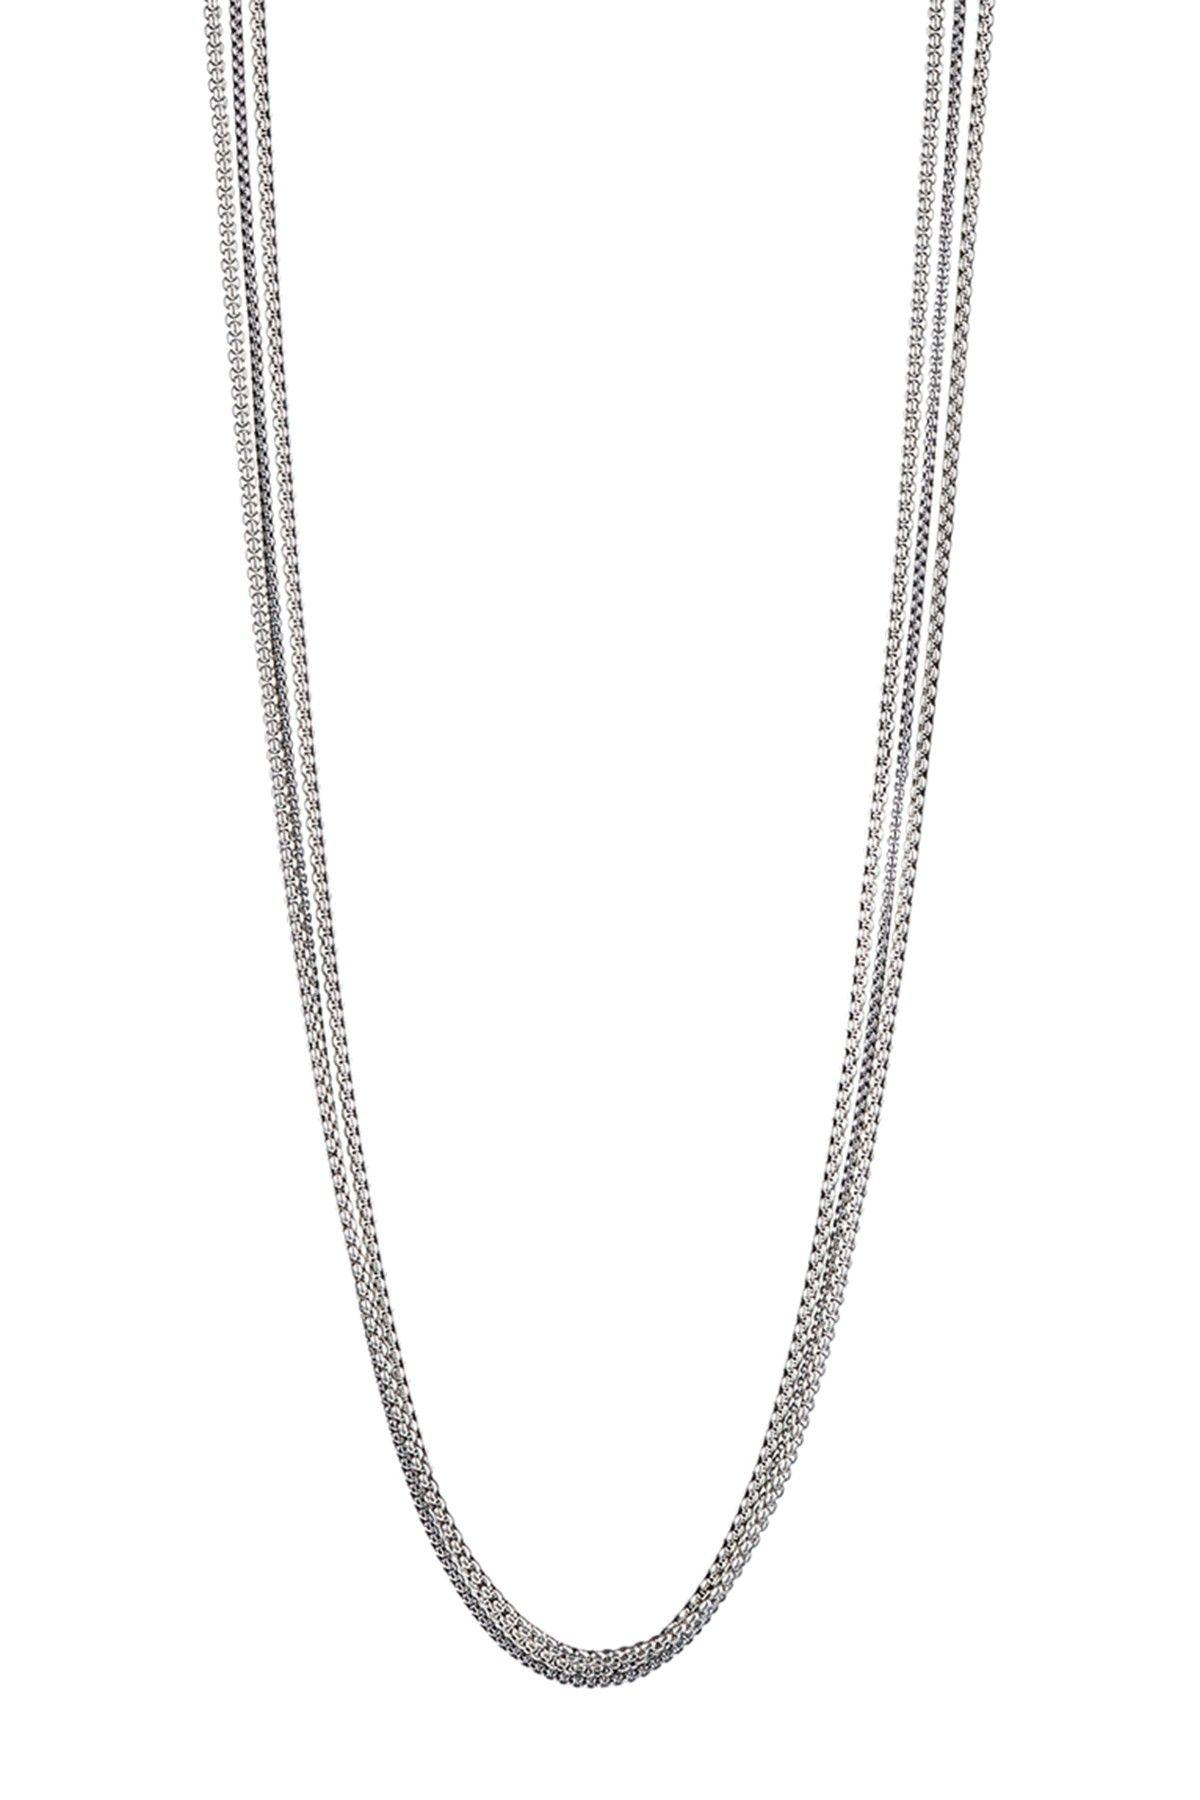 Jenny Bird Billie Sterling Silver Plated Brass Multi Chain Necklace HauteLoo